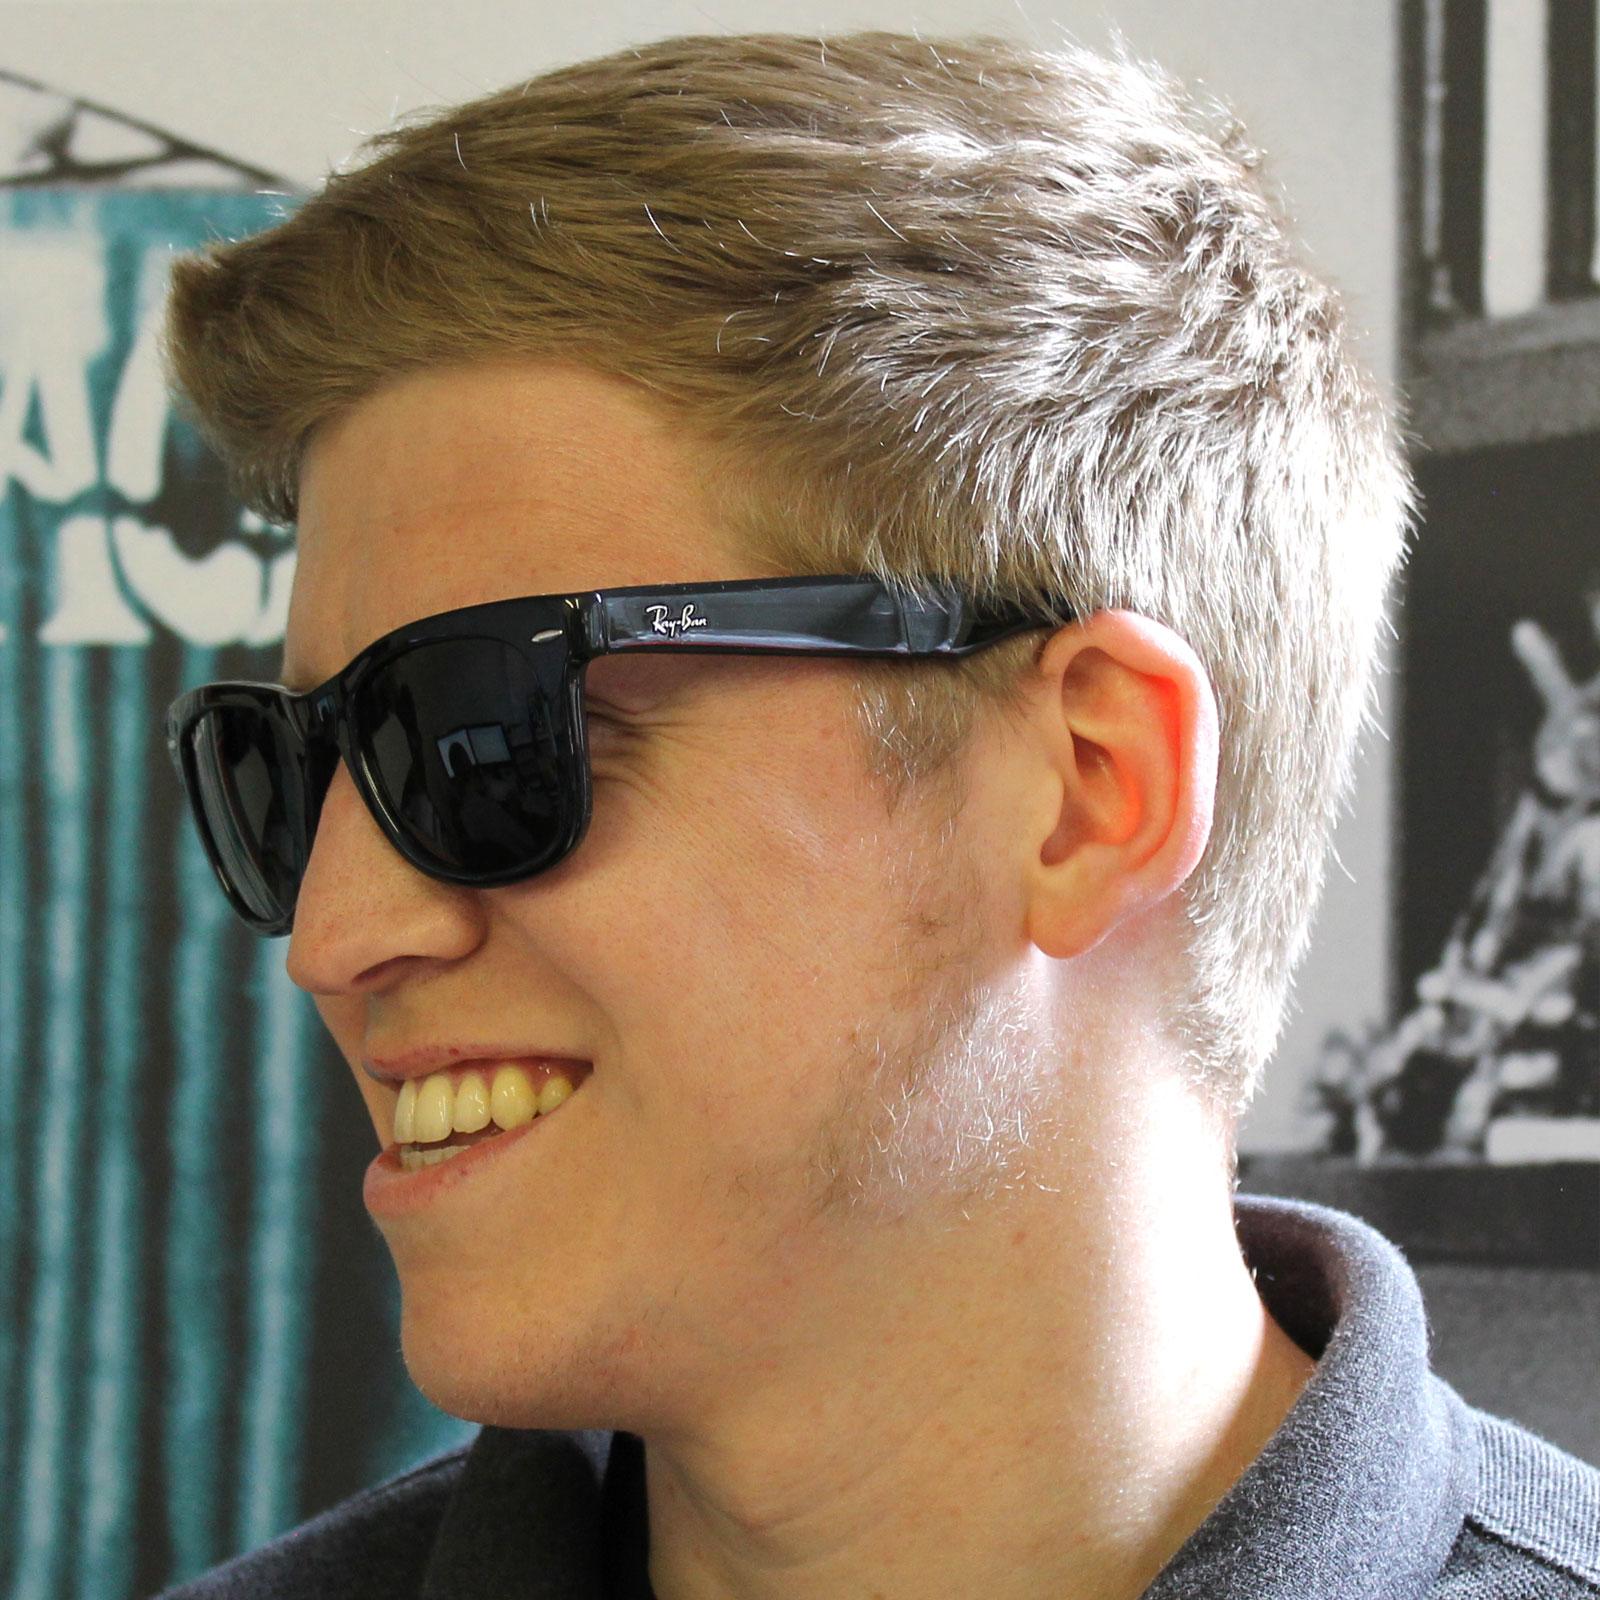 62437a9eadcdf Sentinel Rayban Sunglasses Folding Wayfarer 4105 Black Green Polarized  601 58 54mm